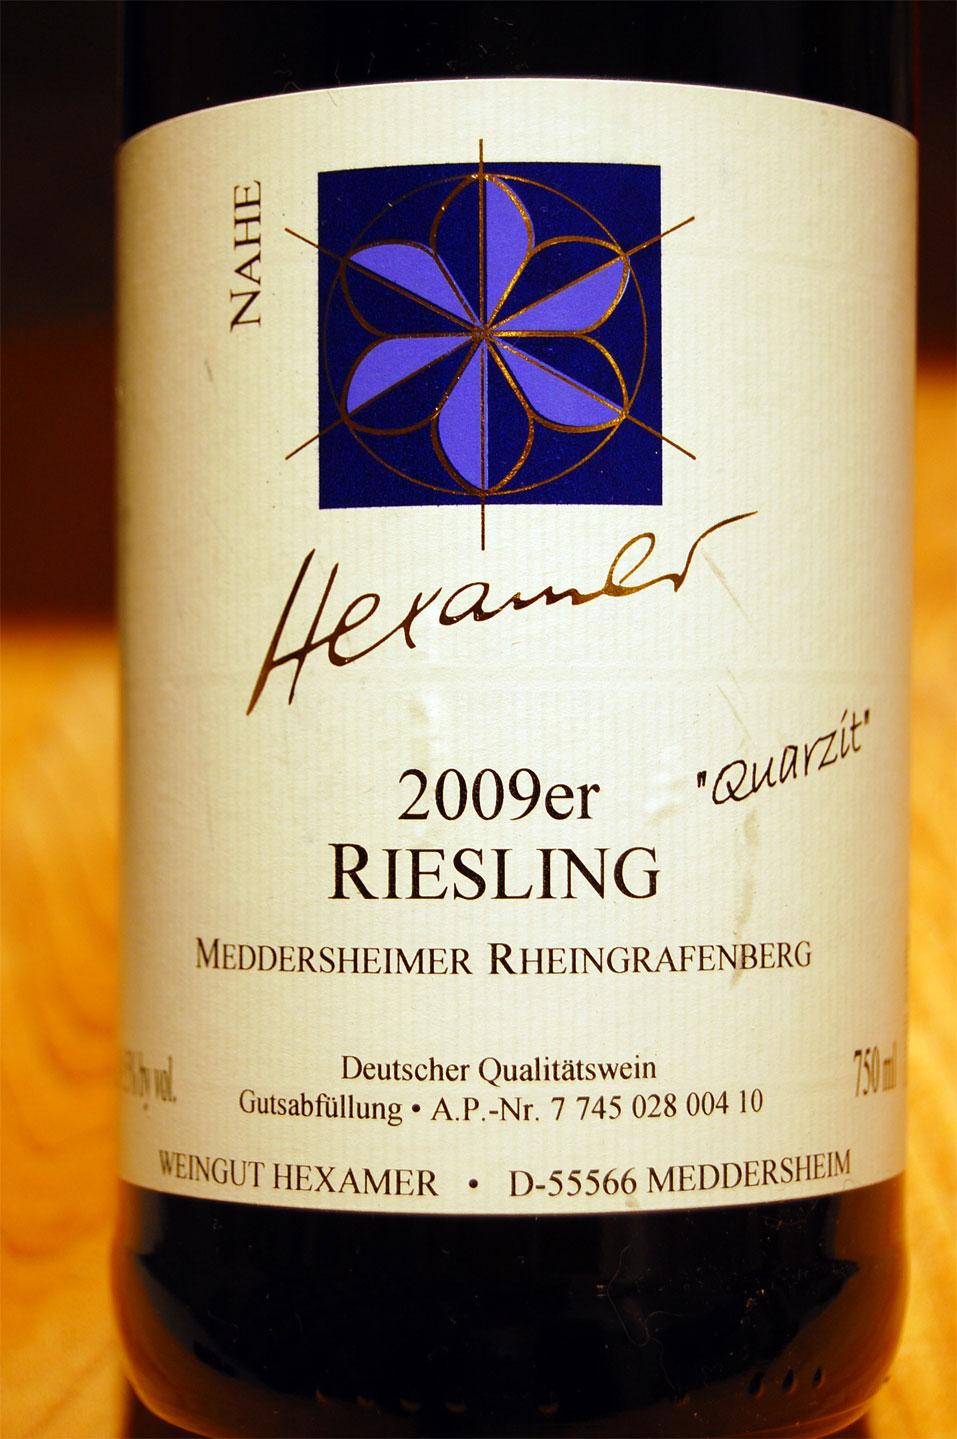 Weingut hexamer meddersheimer rheingrafenberg riesling for Polygonalplatten quarzit tropical yellow